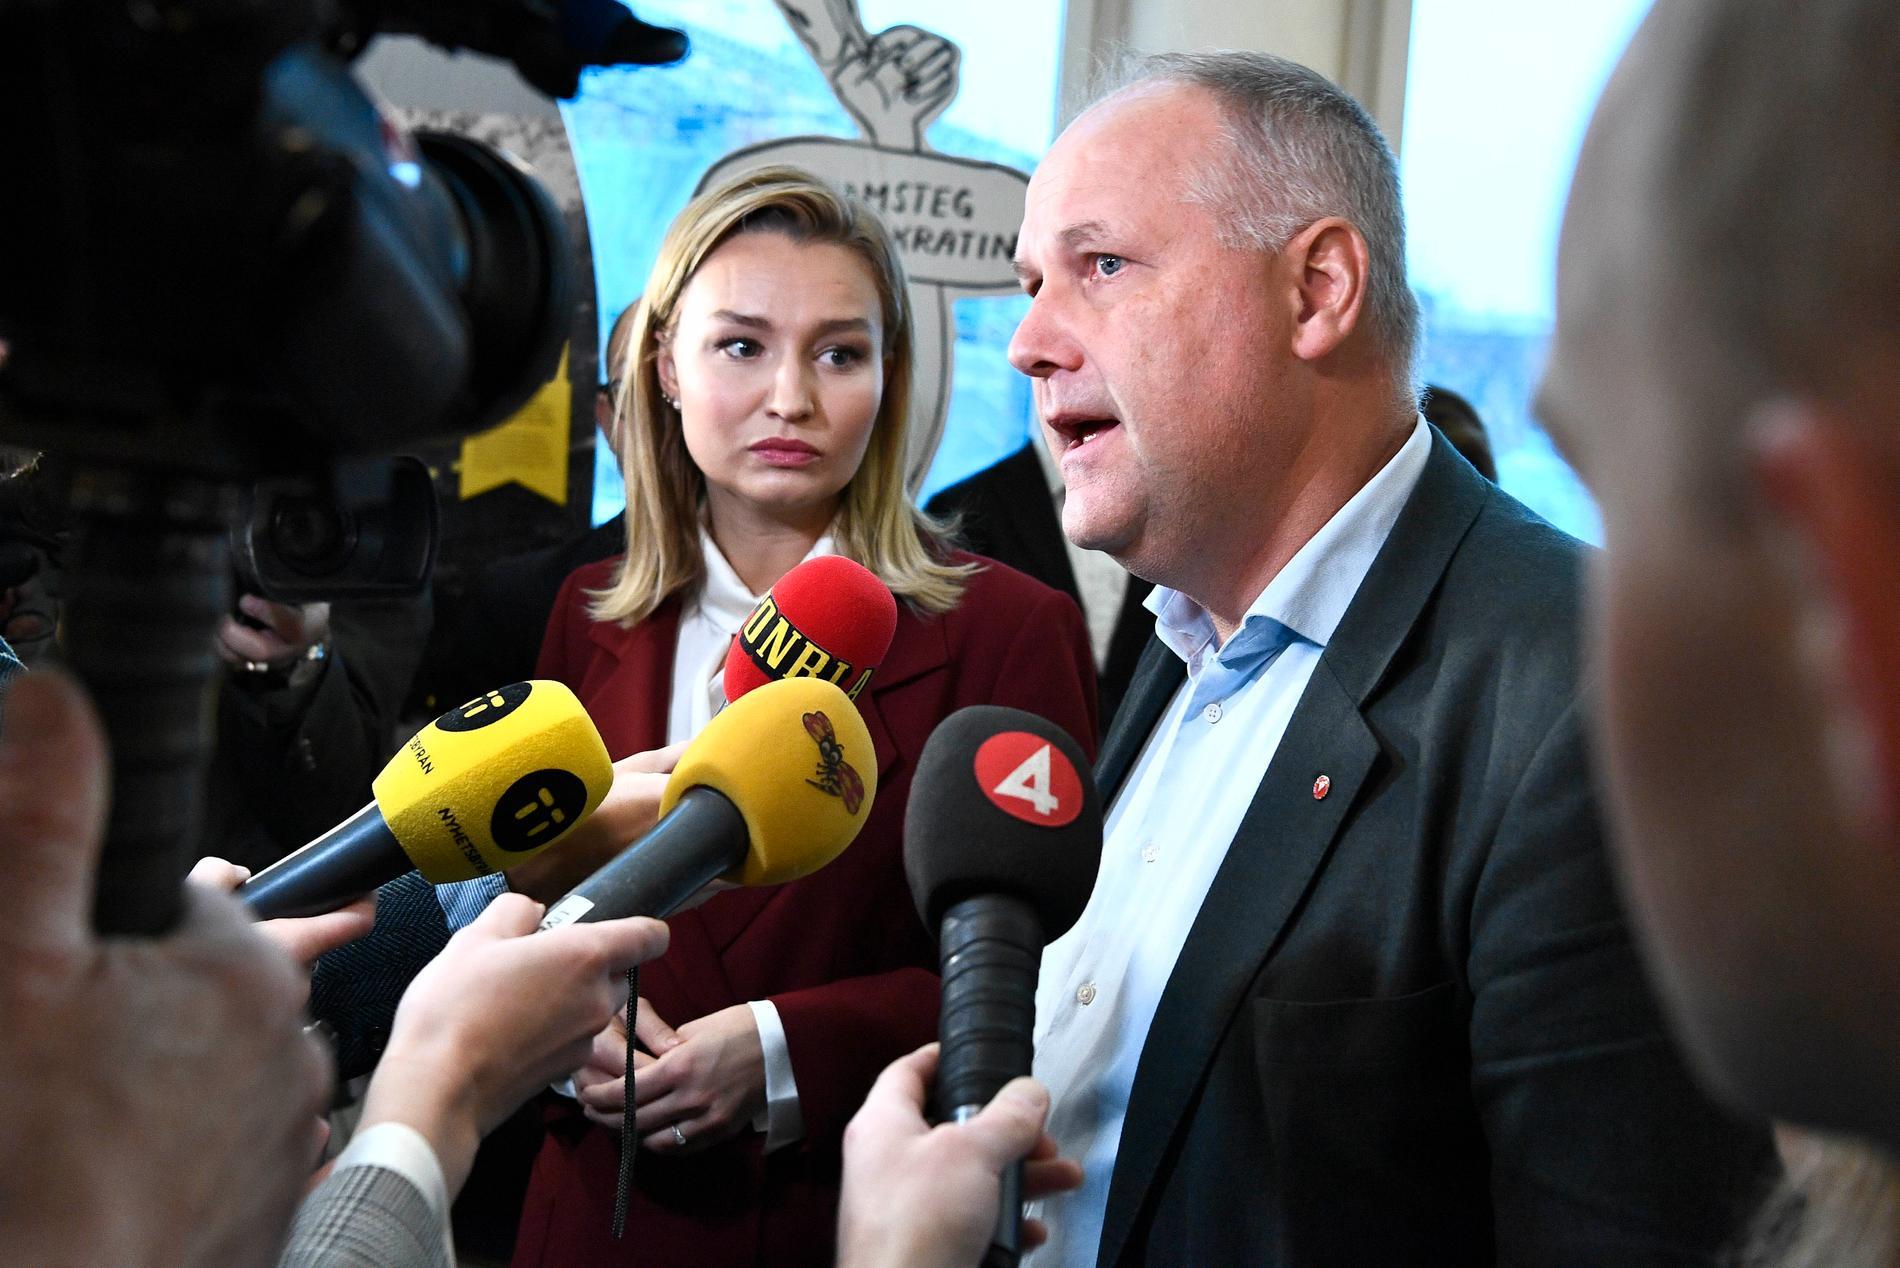 En ohelig allians kan fälla arbetsmarknadsminister Eva Nordmark (S)